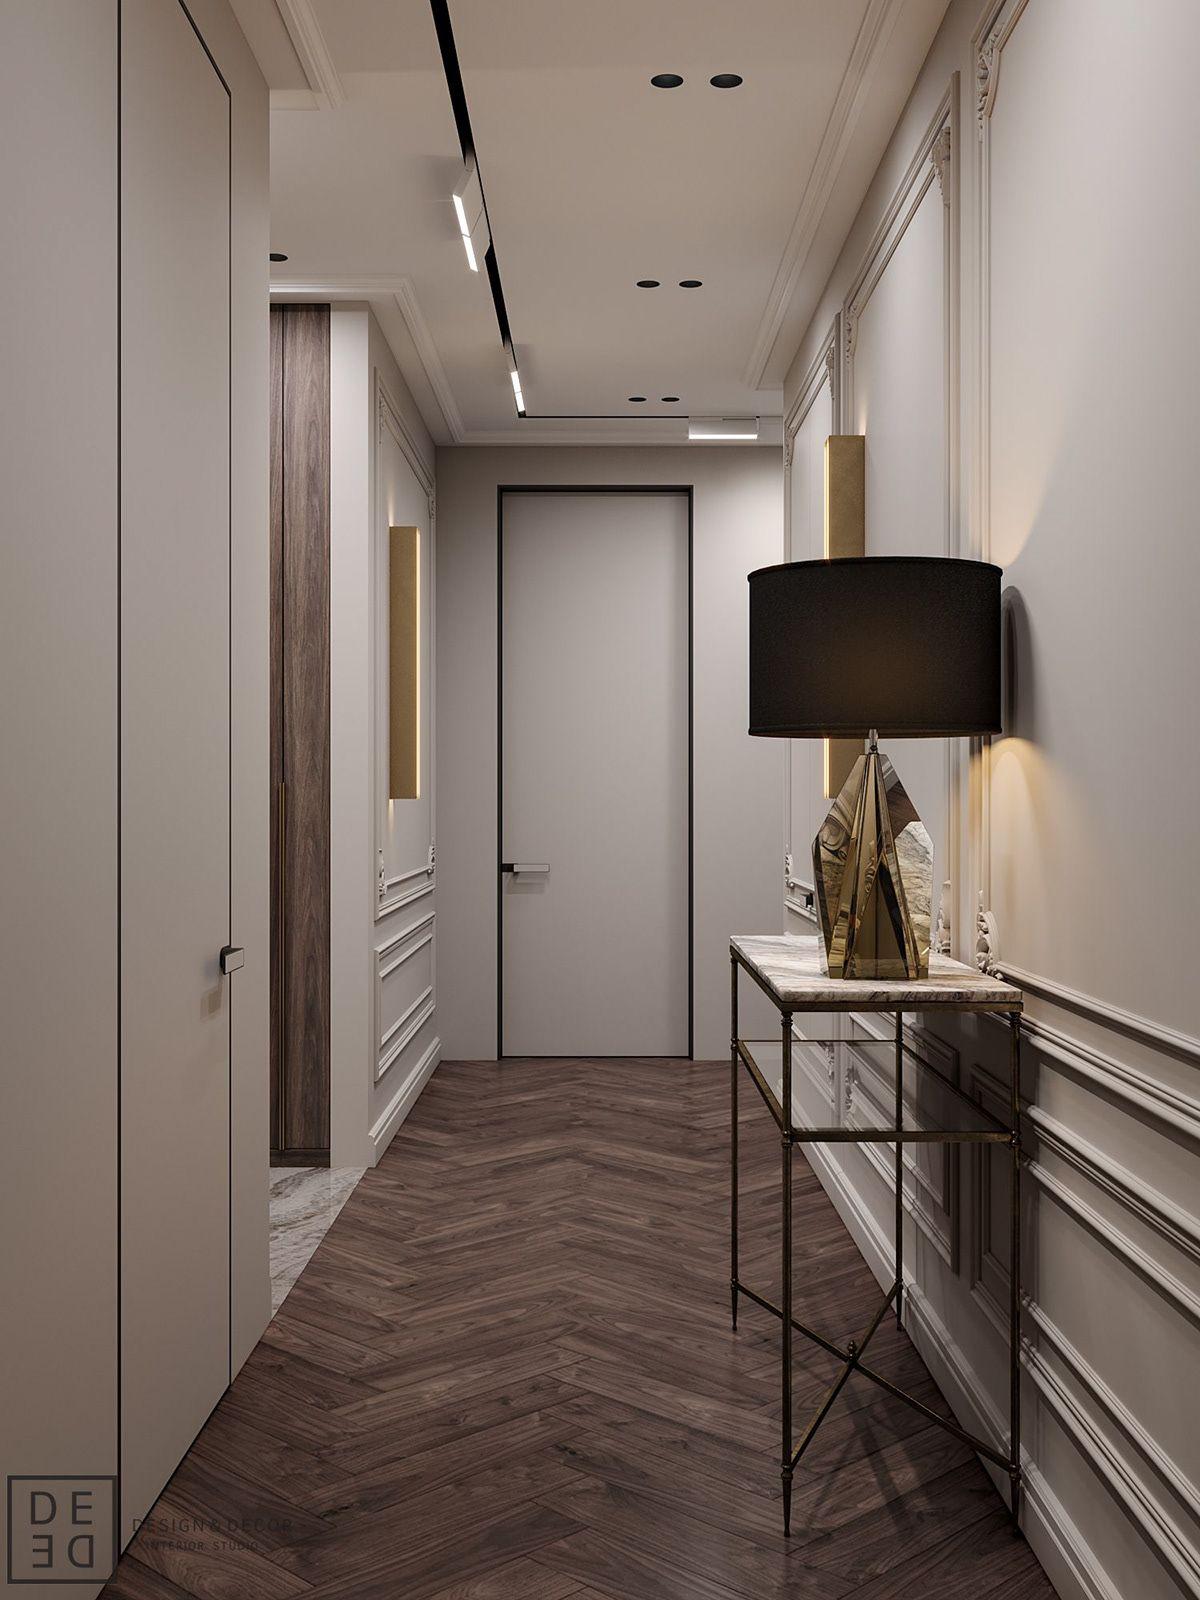 De De Blueberry Flat On Behance Home Interior Design Interior